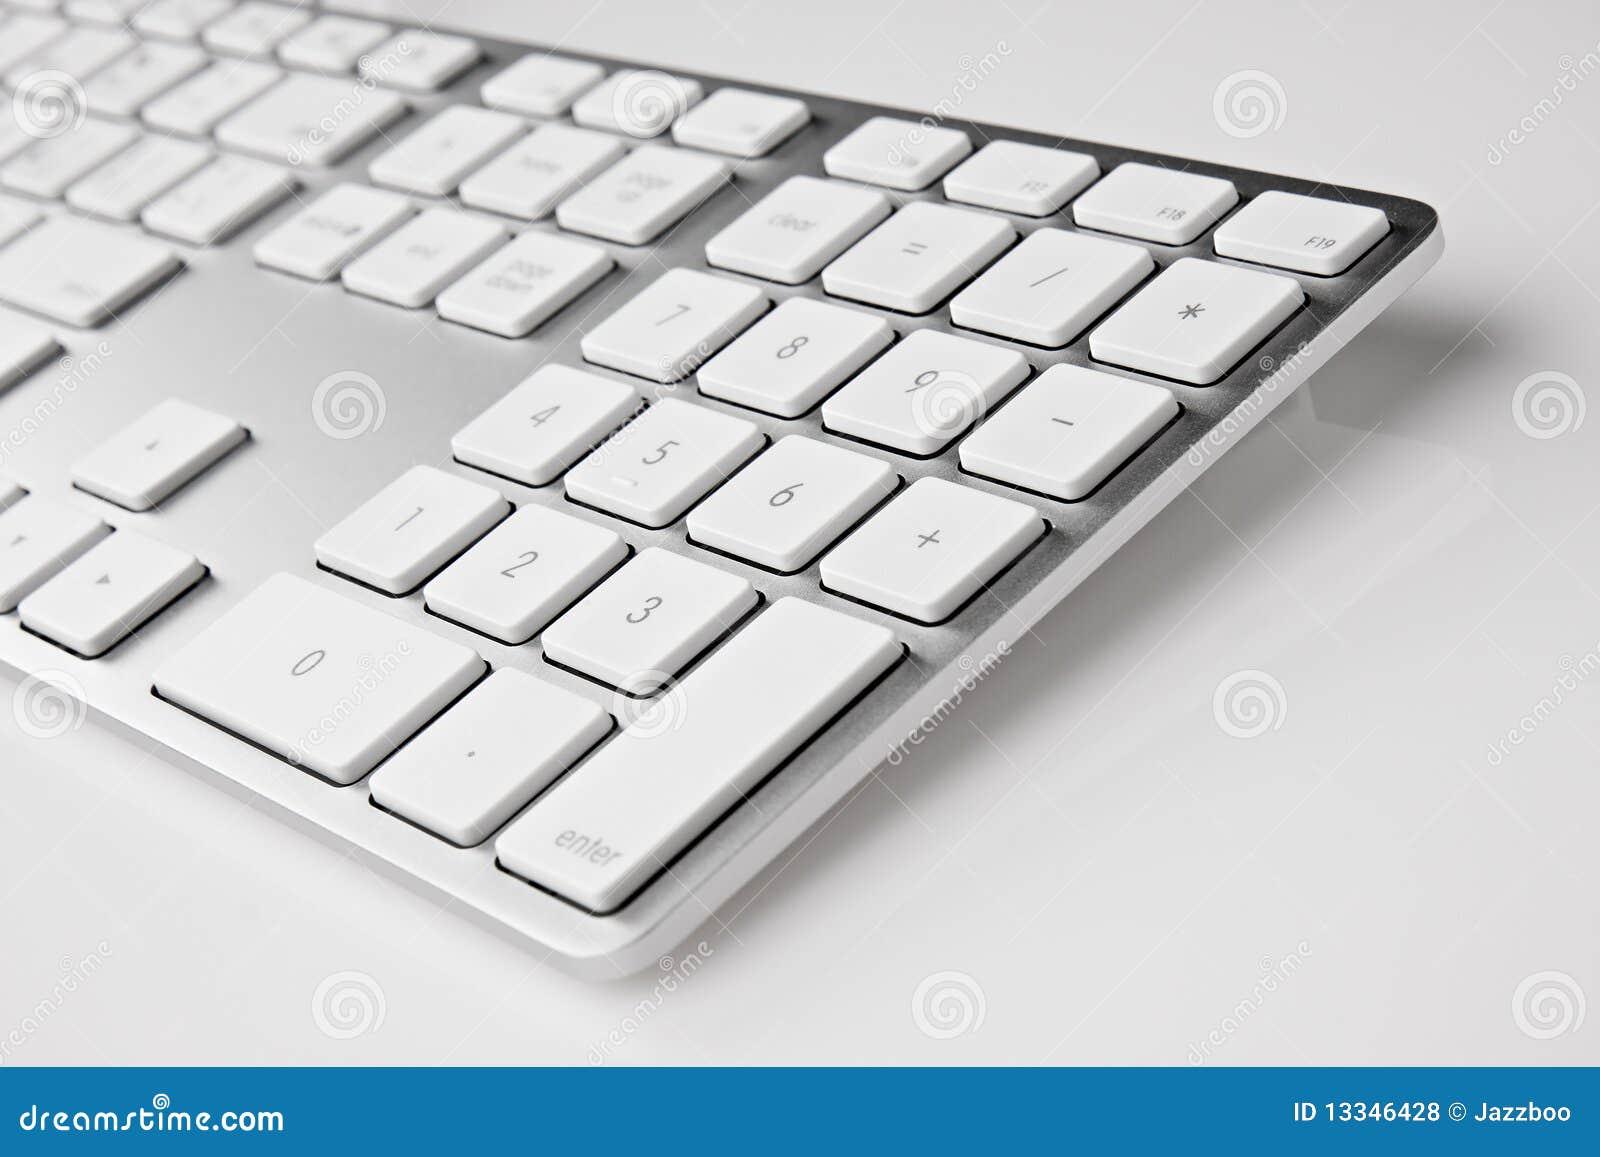 Clavier en aluminium